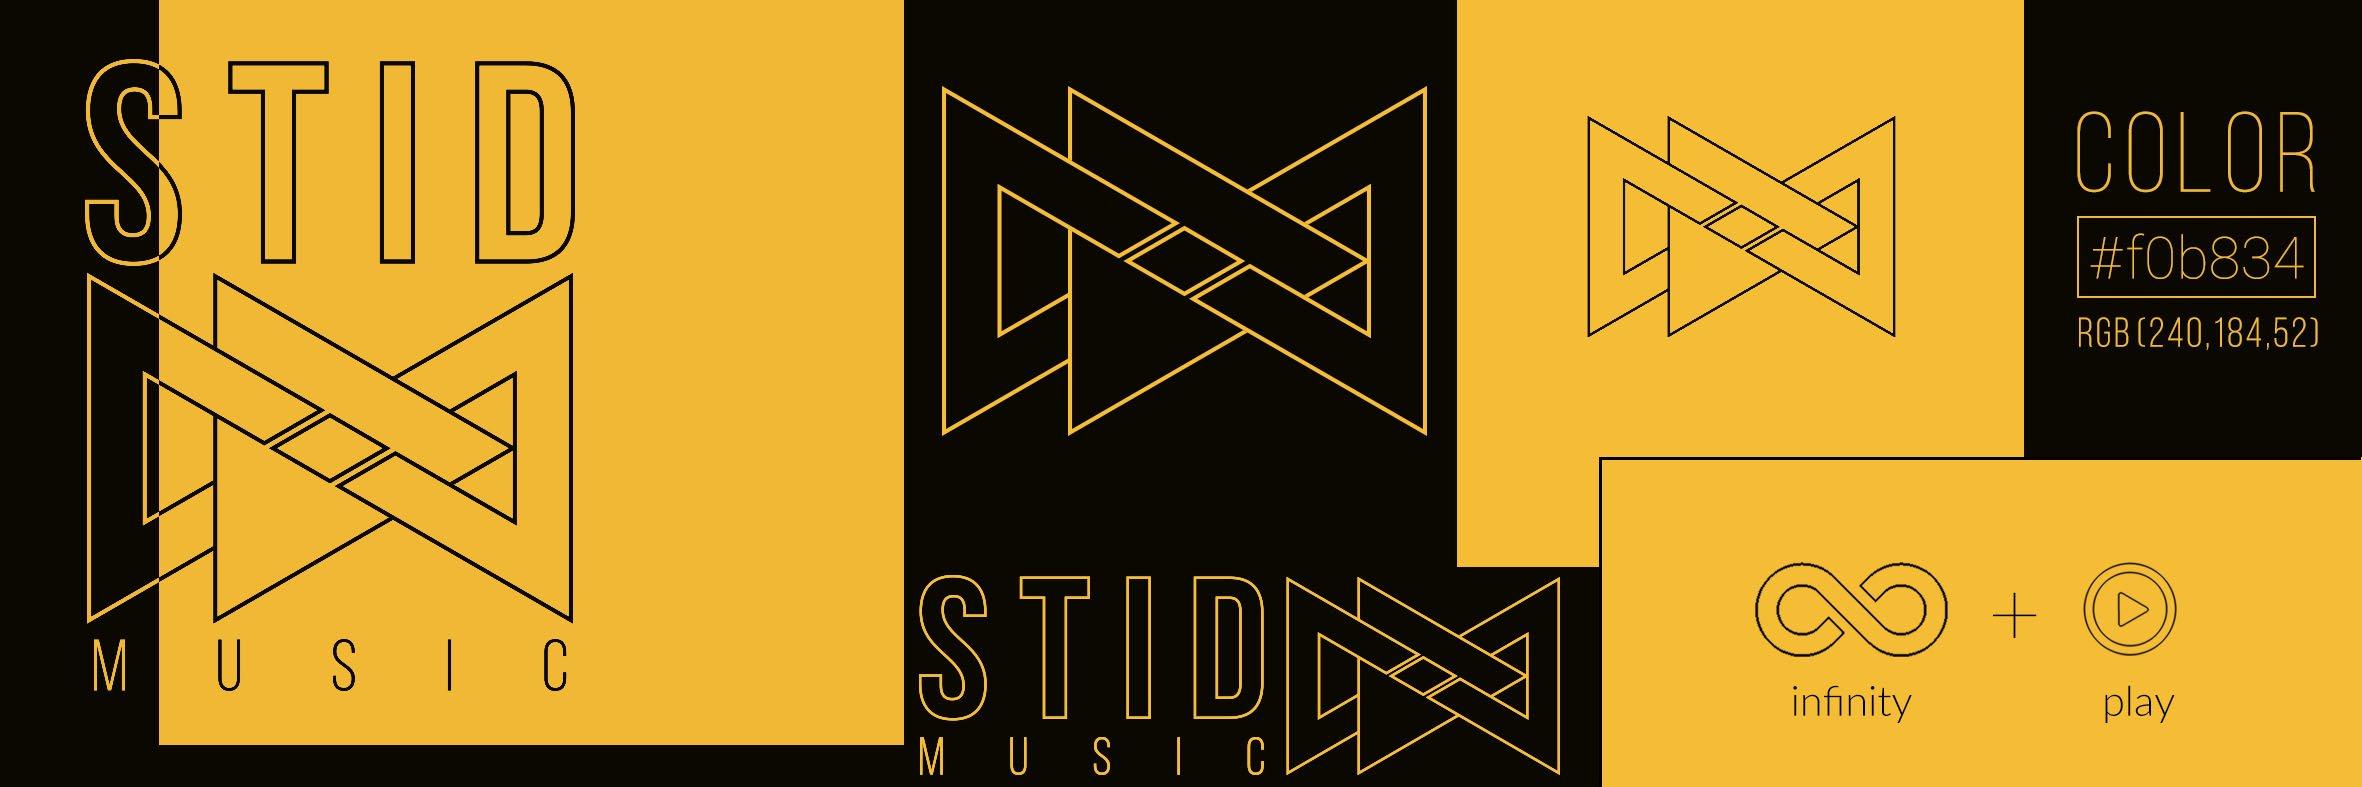 logo design infinity play music stid